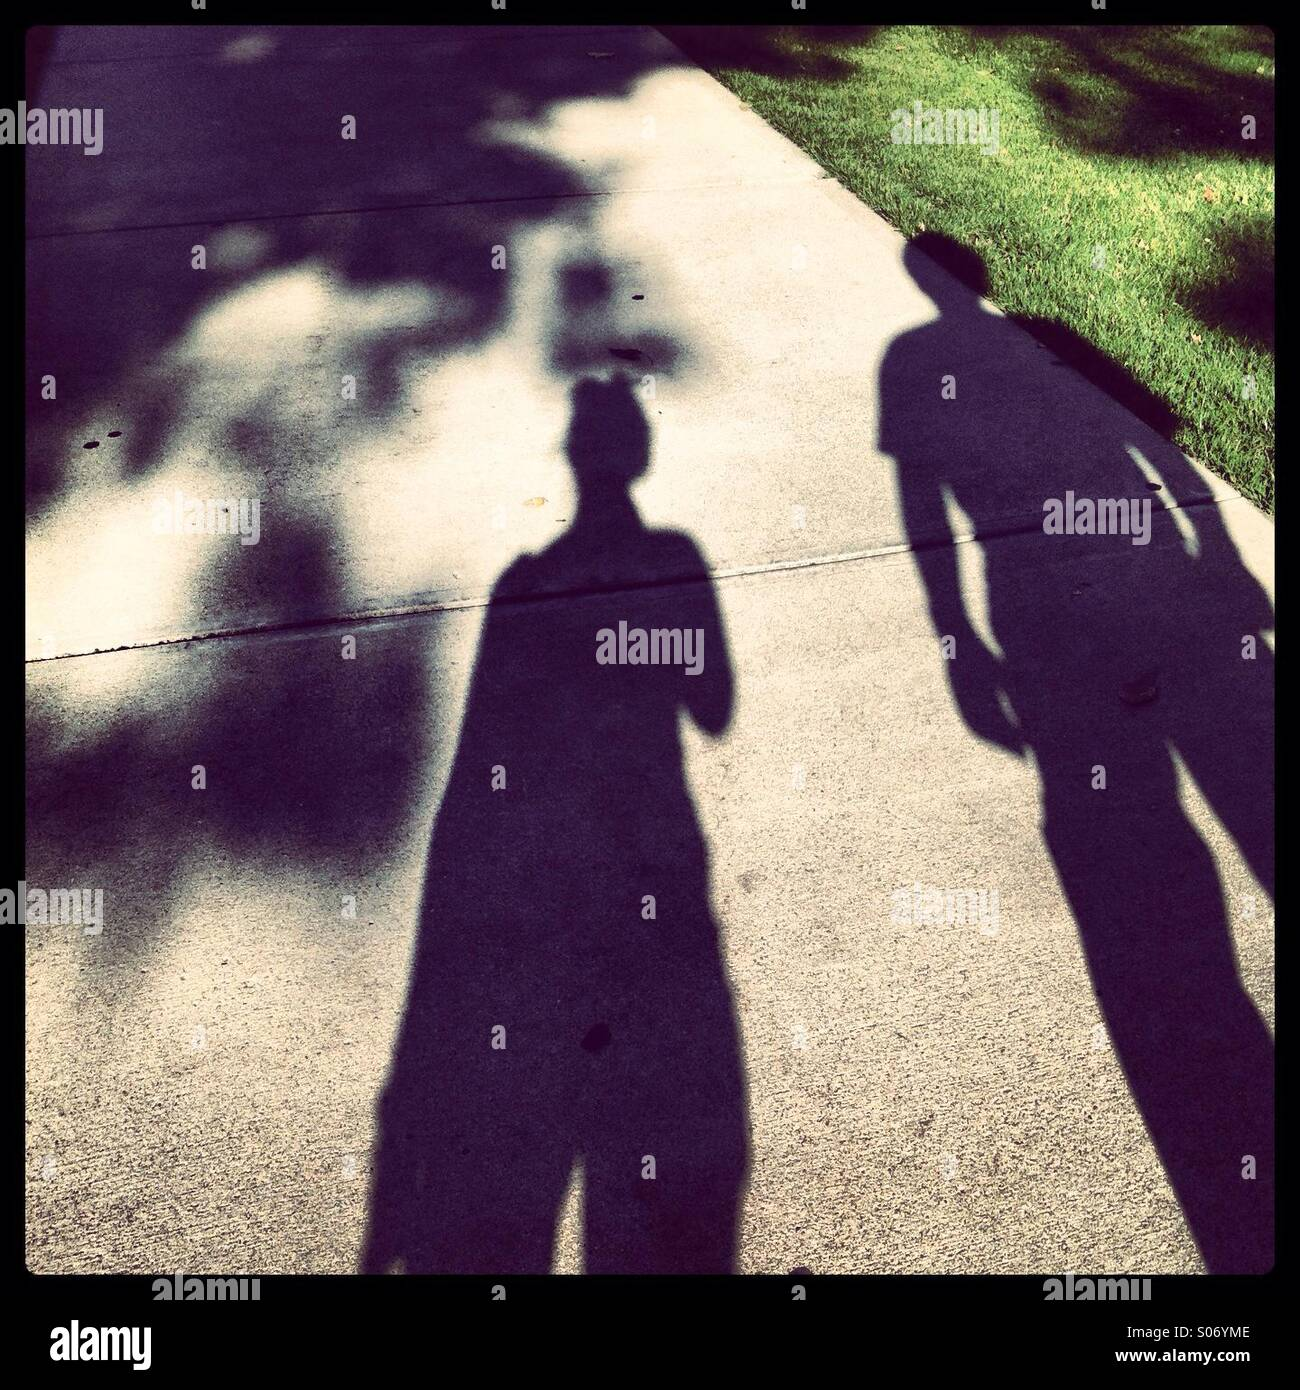 Man and woman shadows on sidewalk - Stock Image